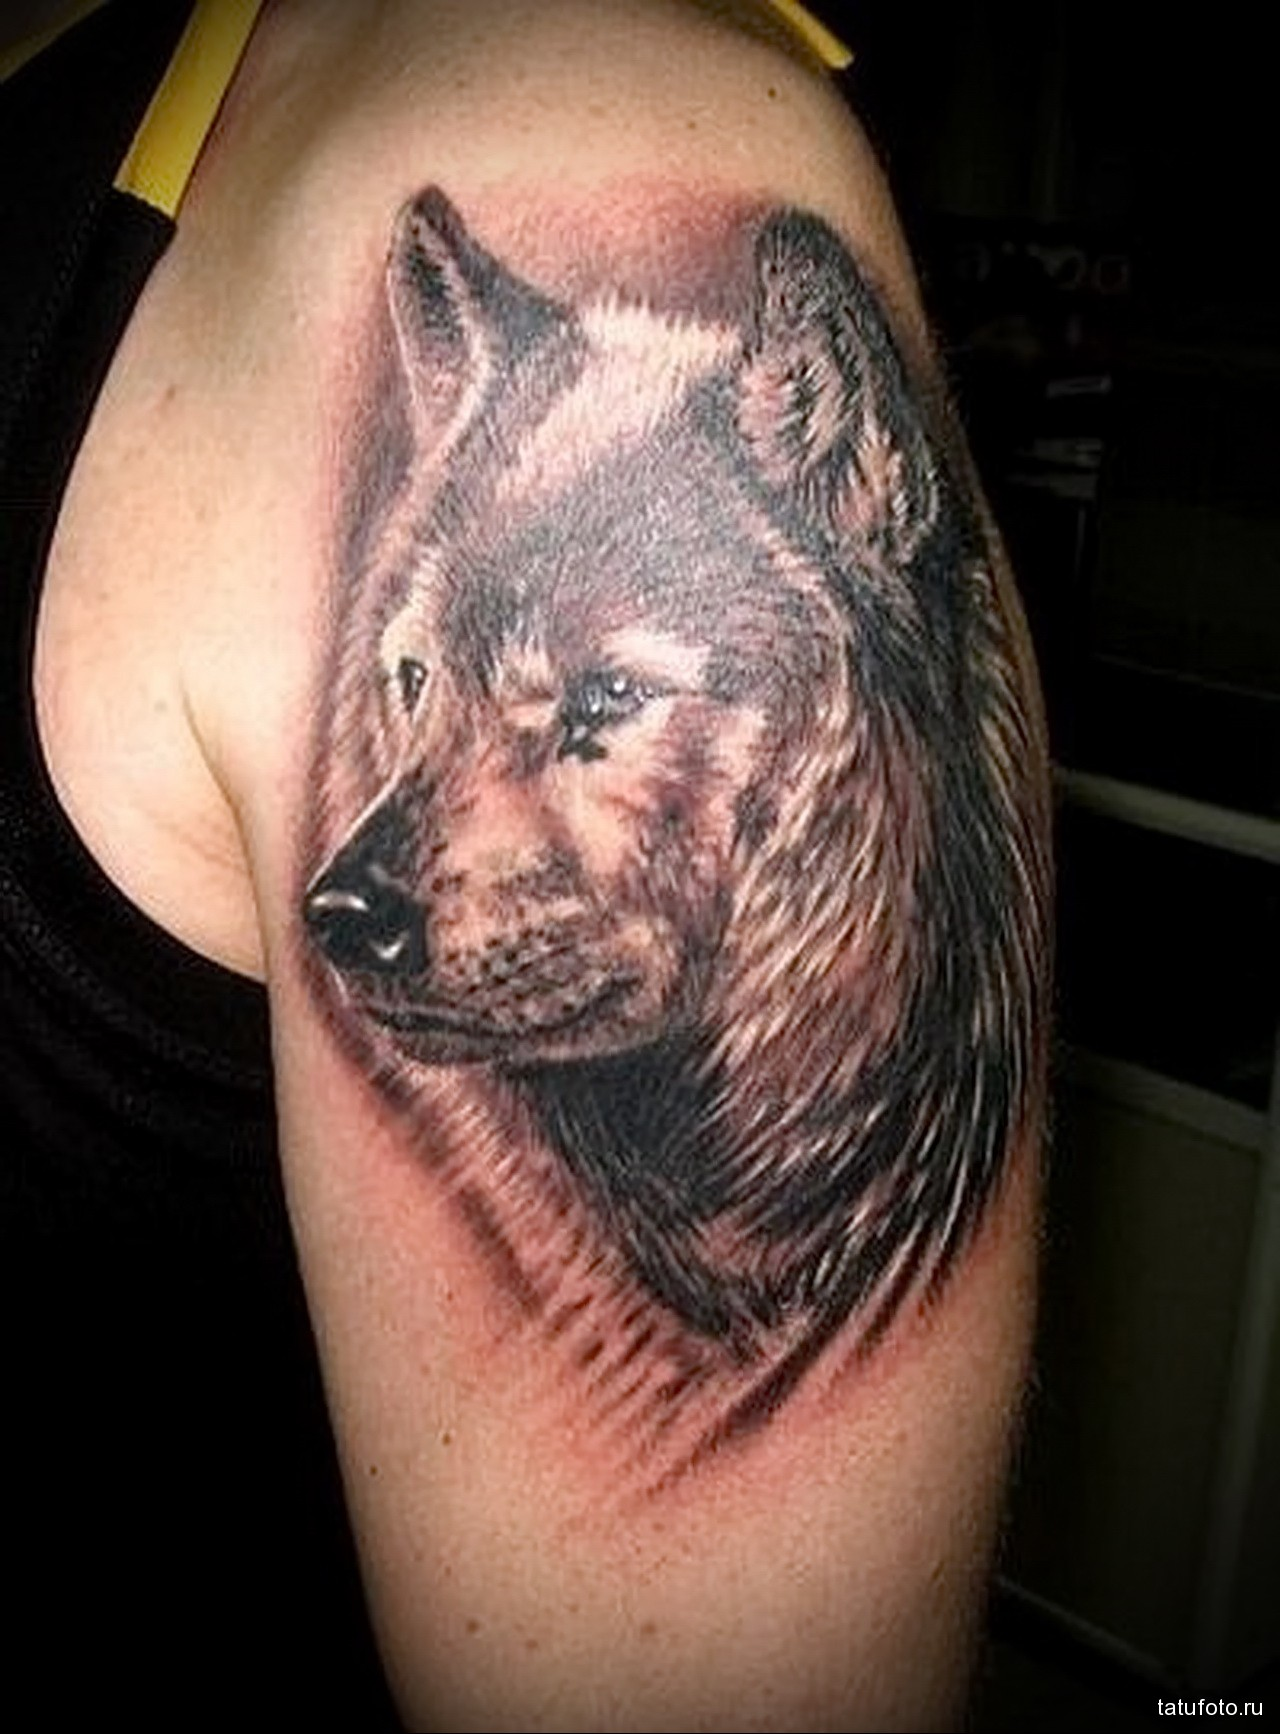 тату морда волка - мужская татуировка на плече